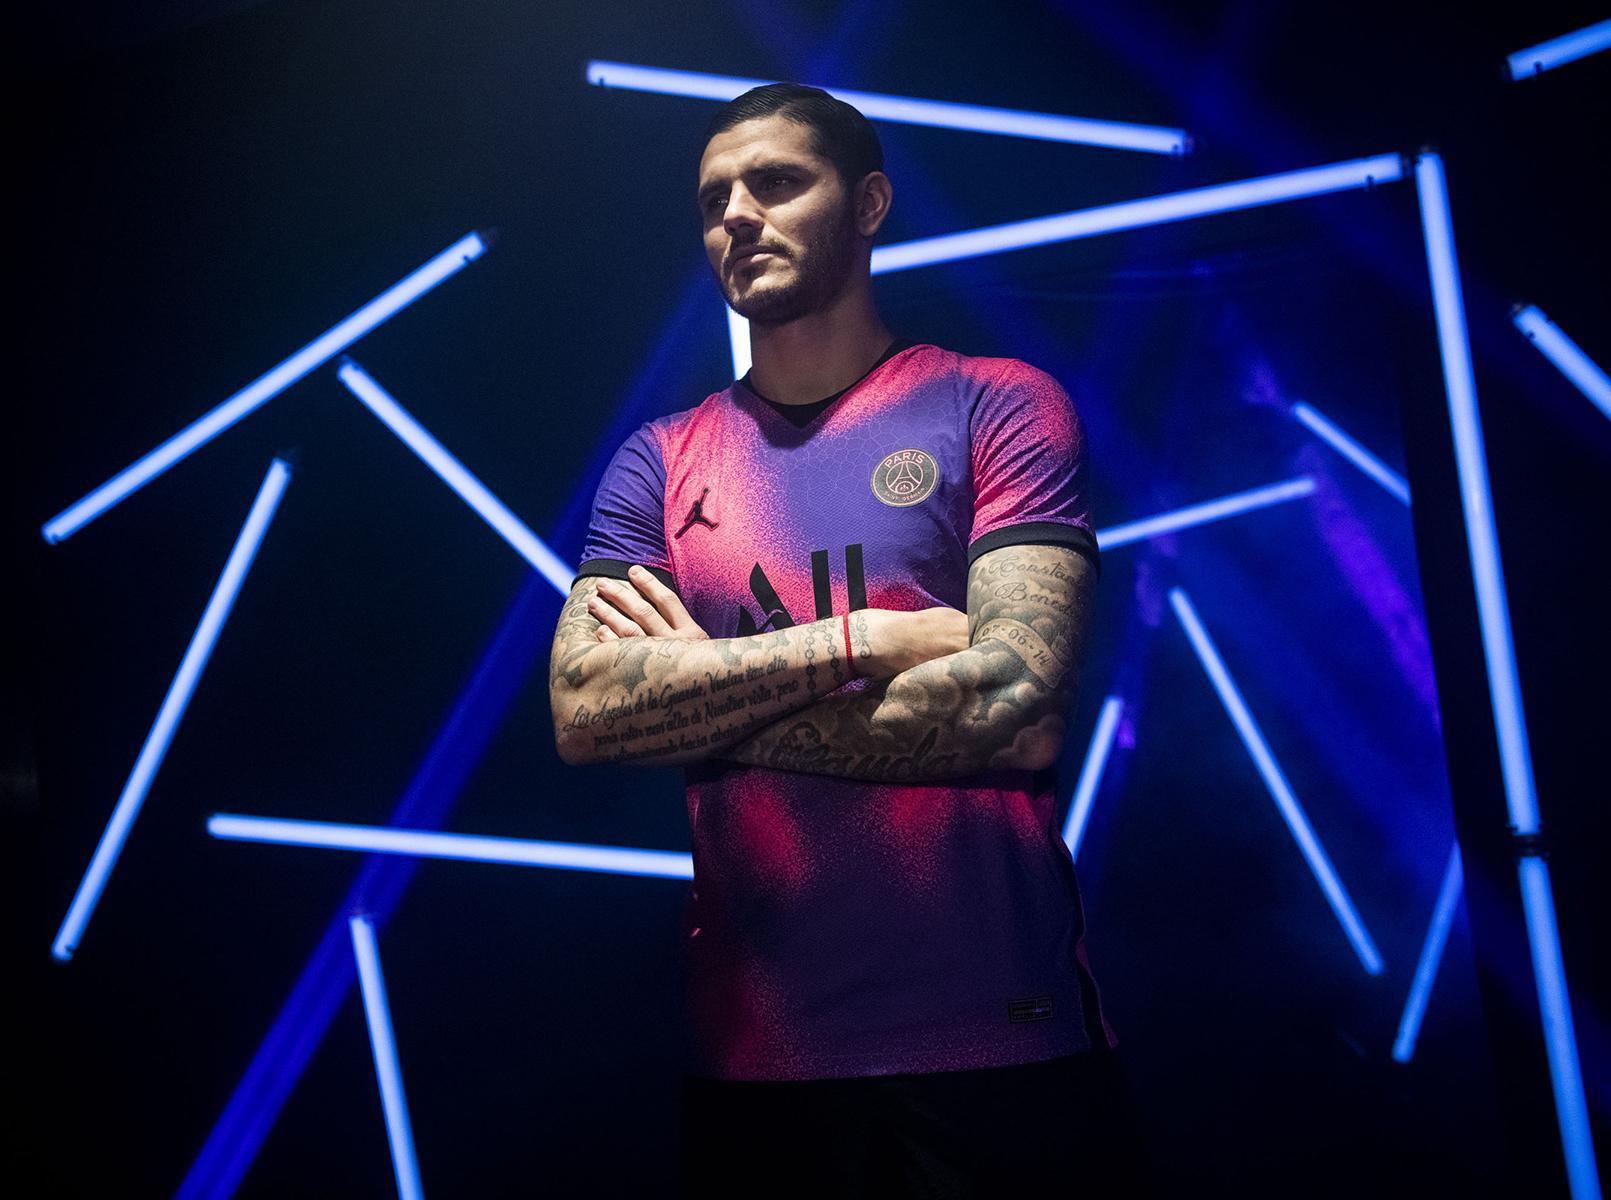 Icardi con la cuarta camiseta del PSG 2021 x Jordan   Imagen Nike